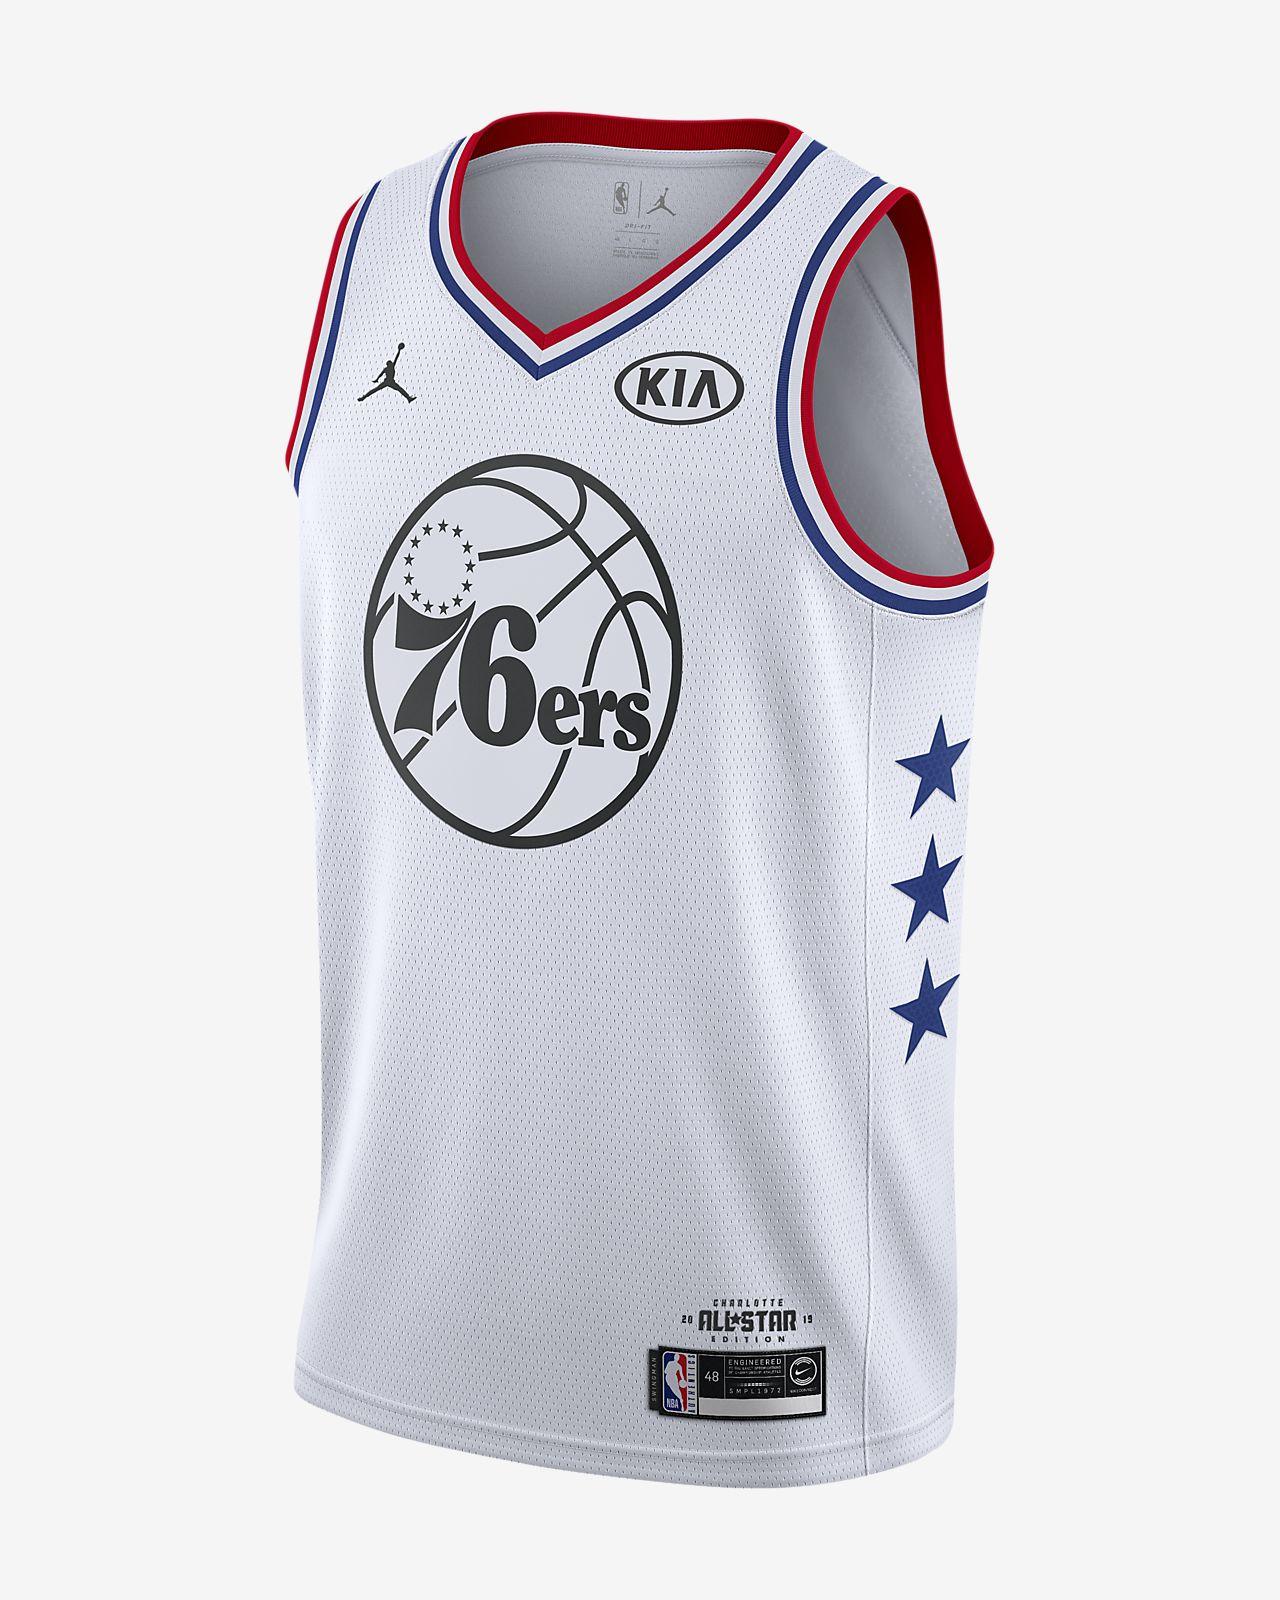 266454e94040a6 Men s Jordan NBA Connected Jersey. Joel Embiid All-Star Edition Swingman